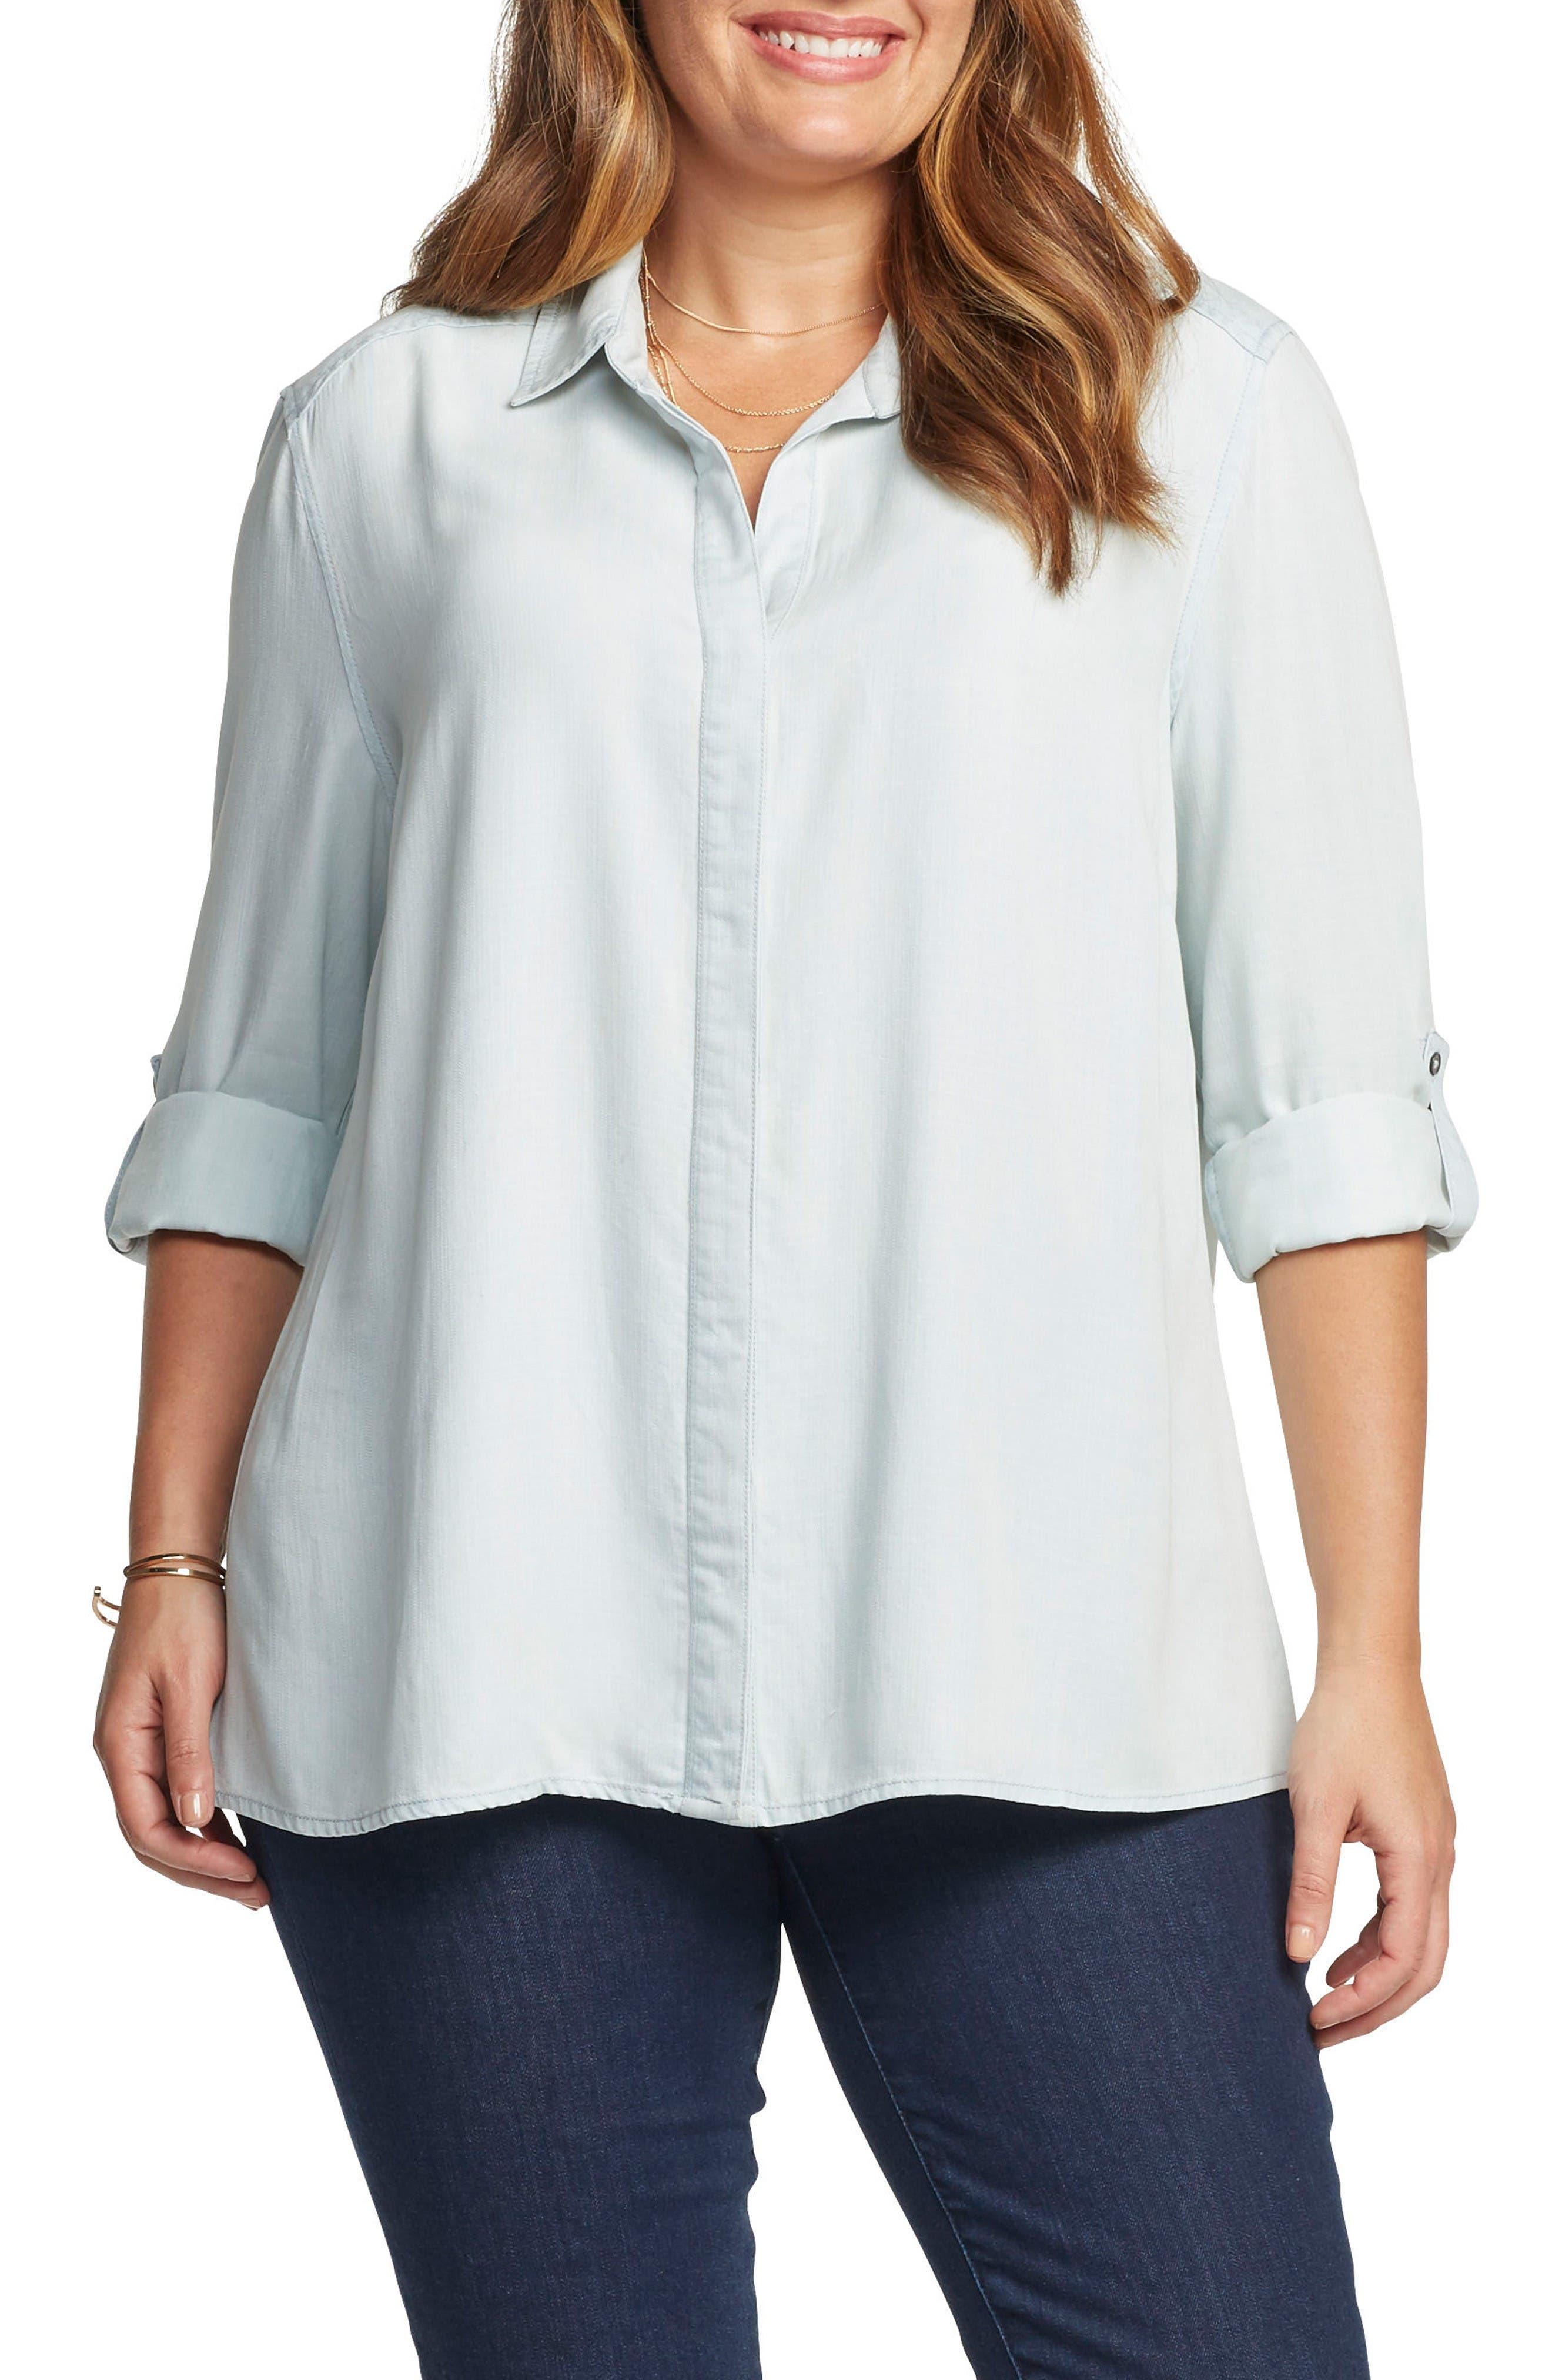 Tart Caroline Roll Sleeve Top (Plus Size)